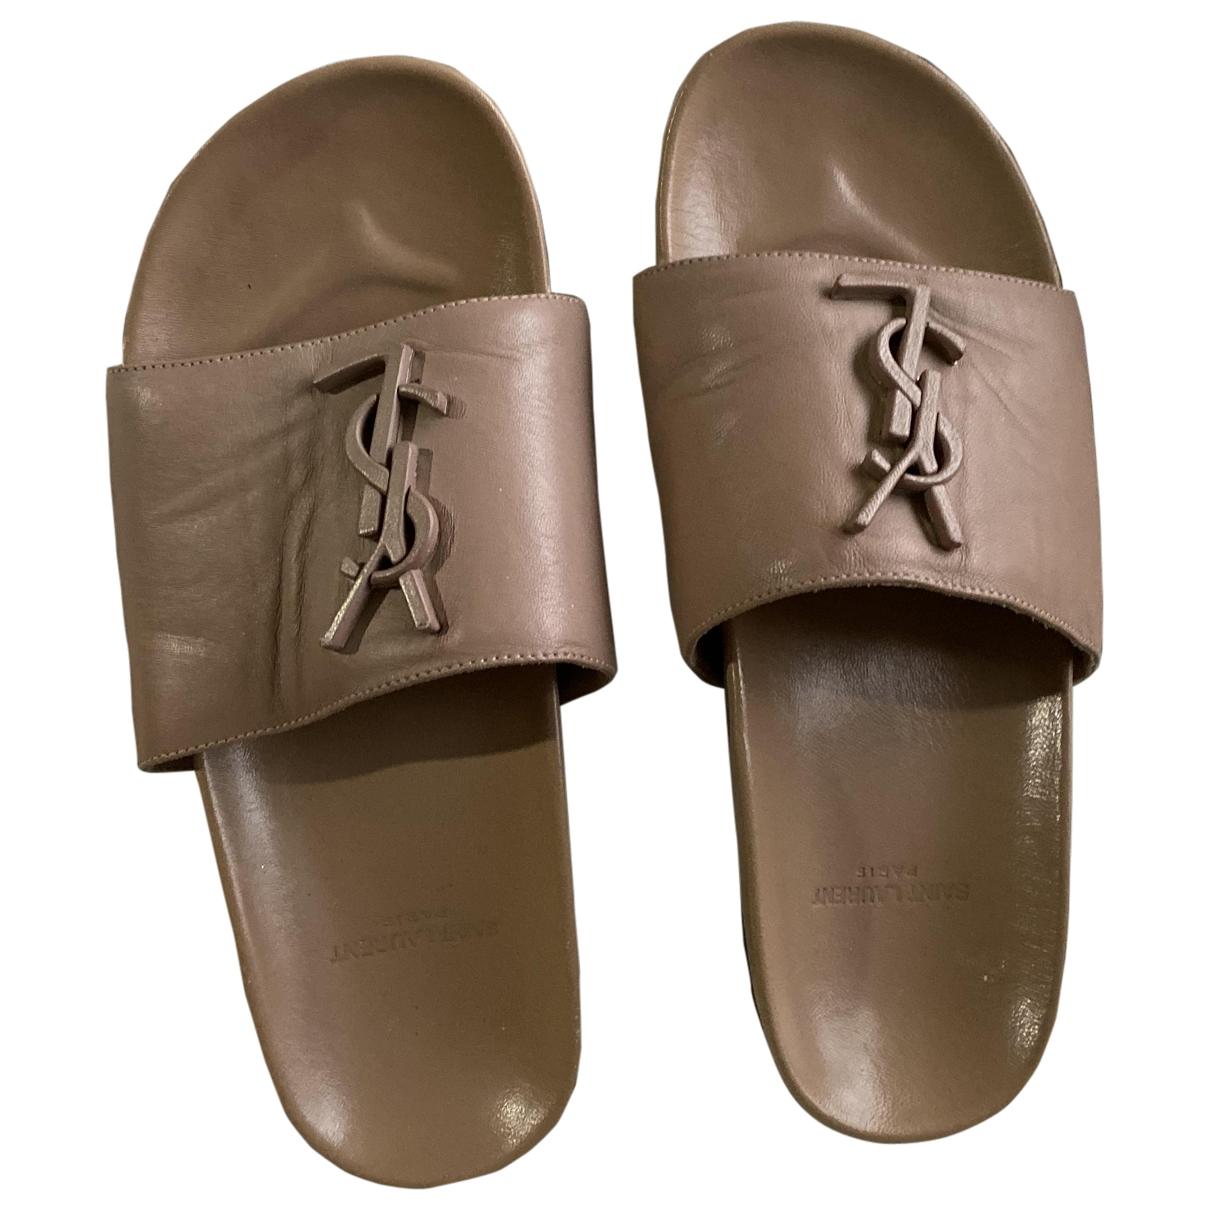 Saint Laurent \N Beige Leather Sandals for Women 36 EU